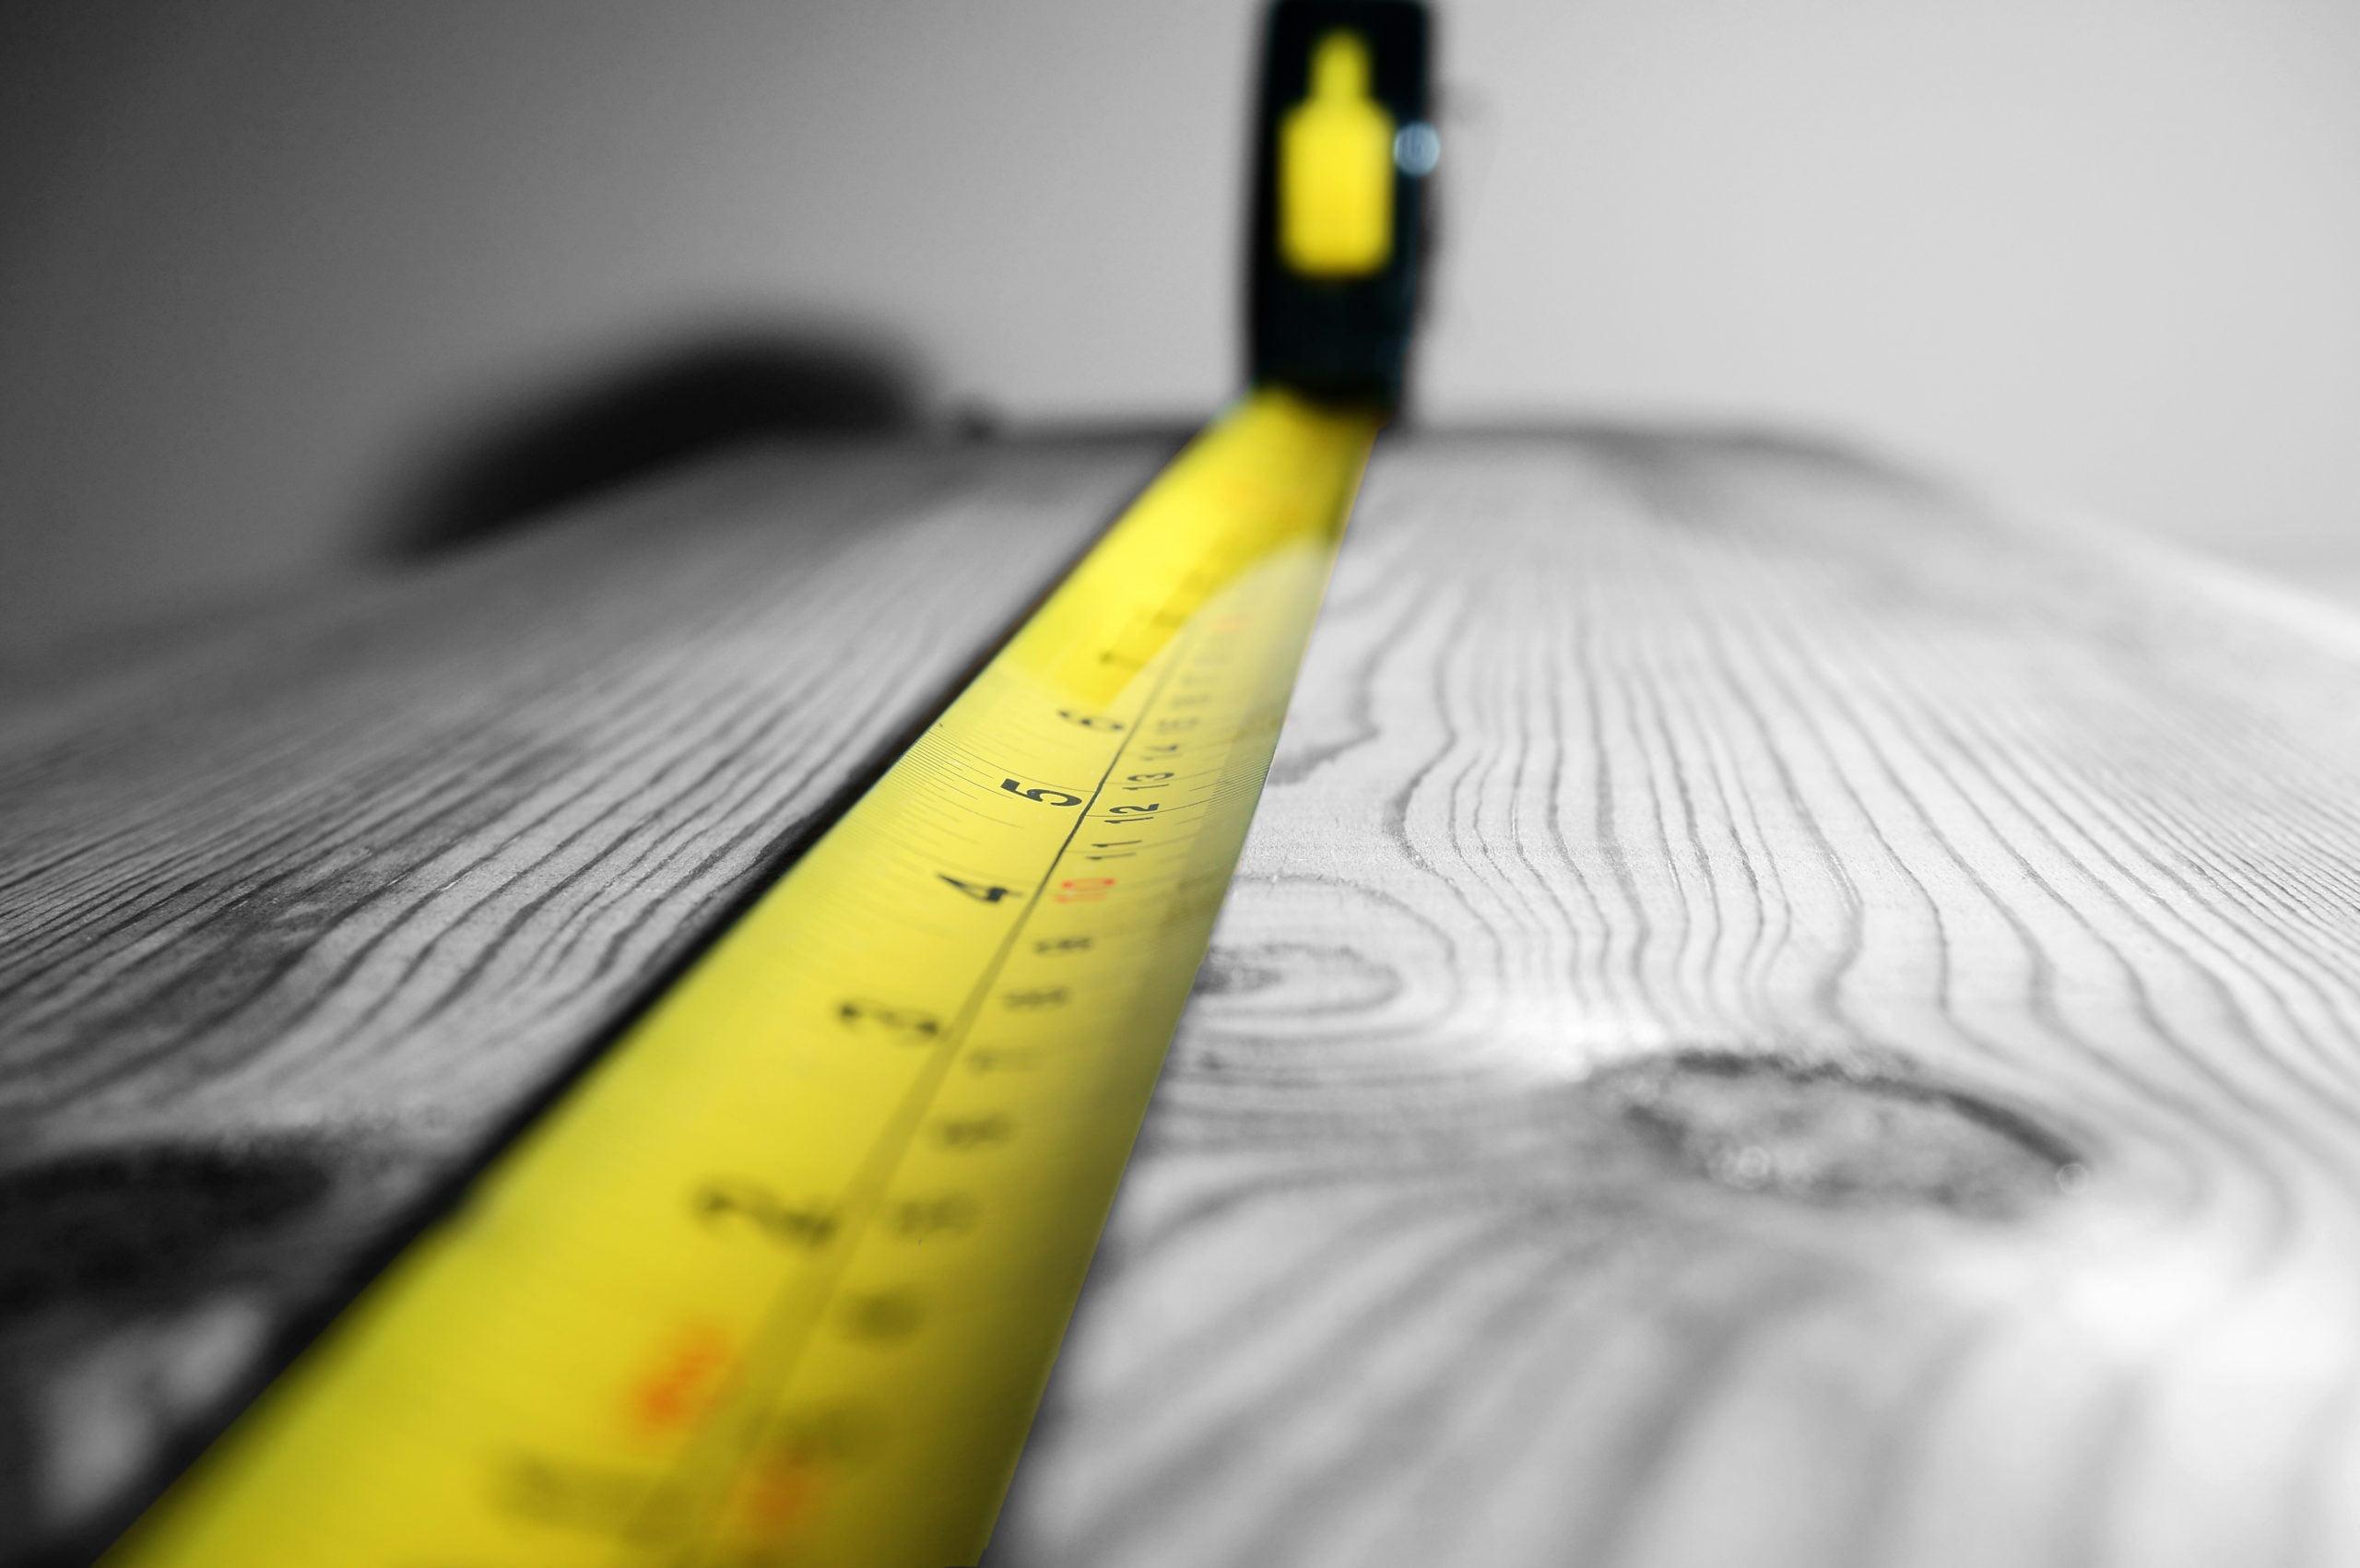 bitcoin trend measuring tool shutterstock_288081992